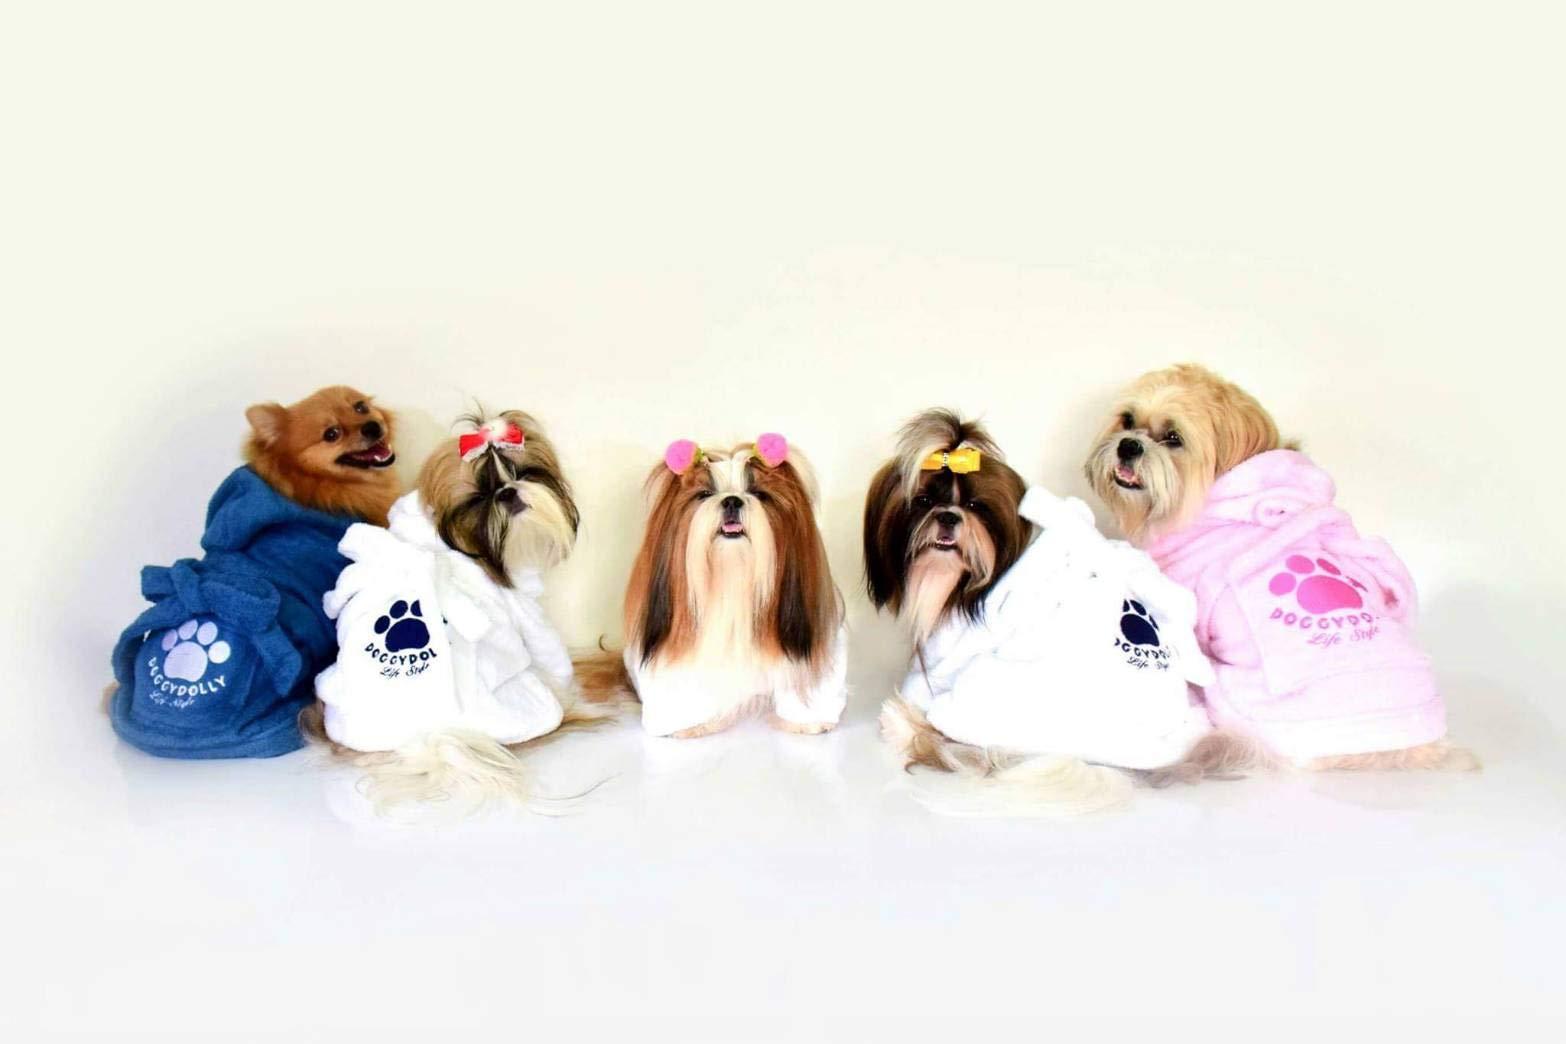 Peignoir pour chiens DRF001-XXL von Doggydolly